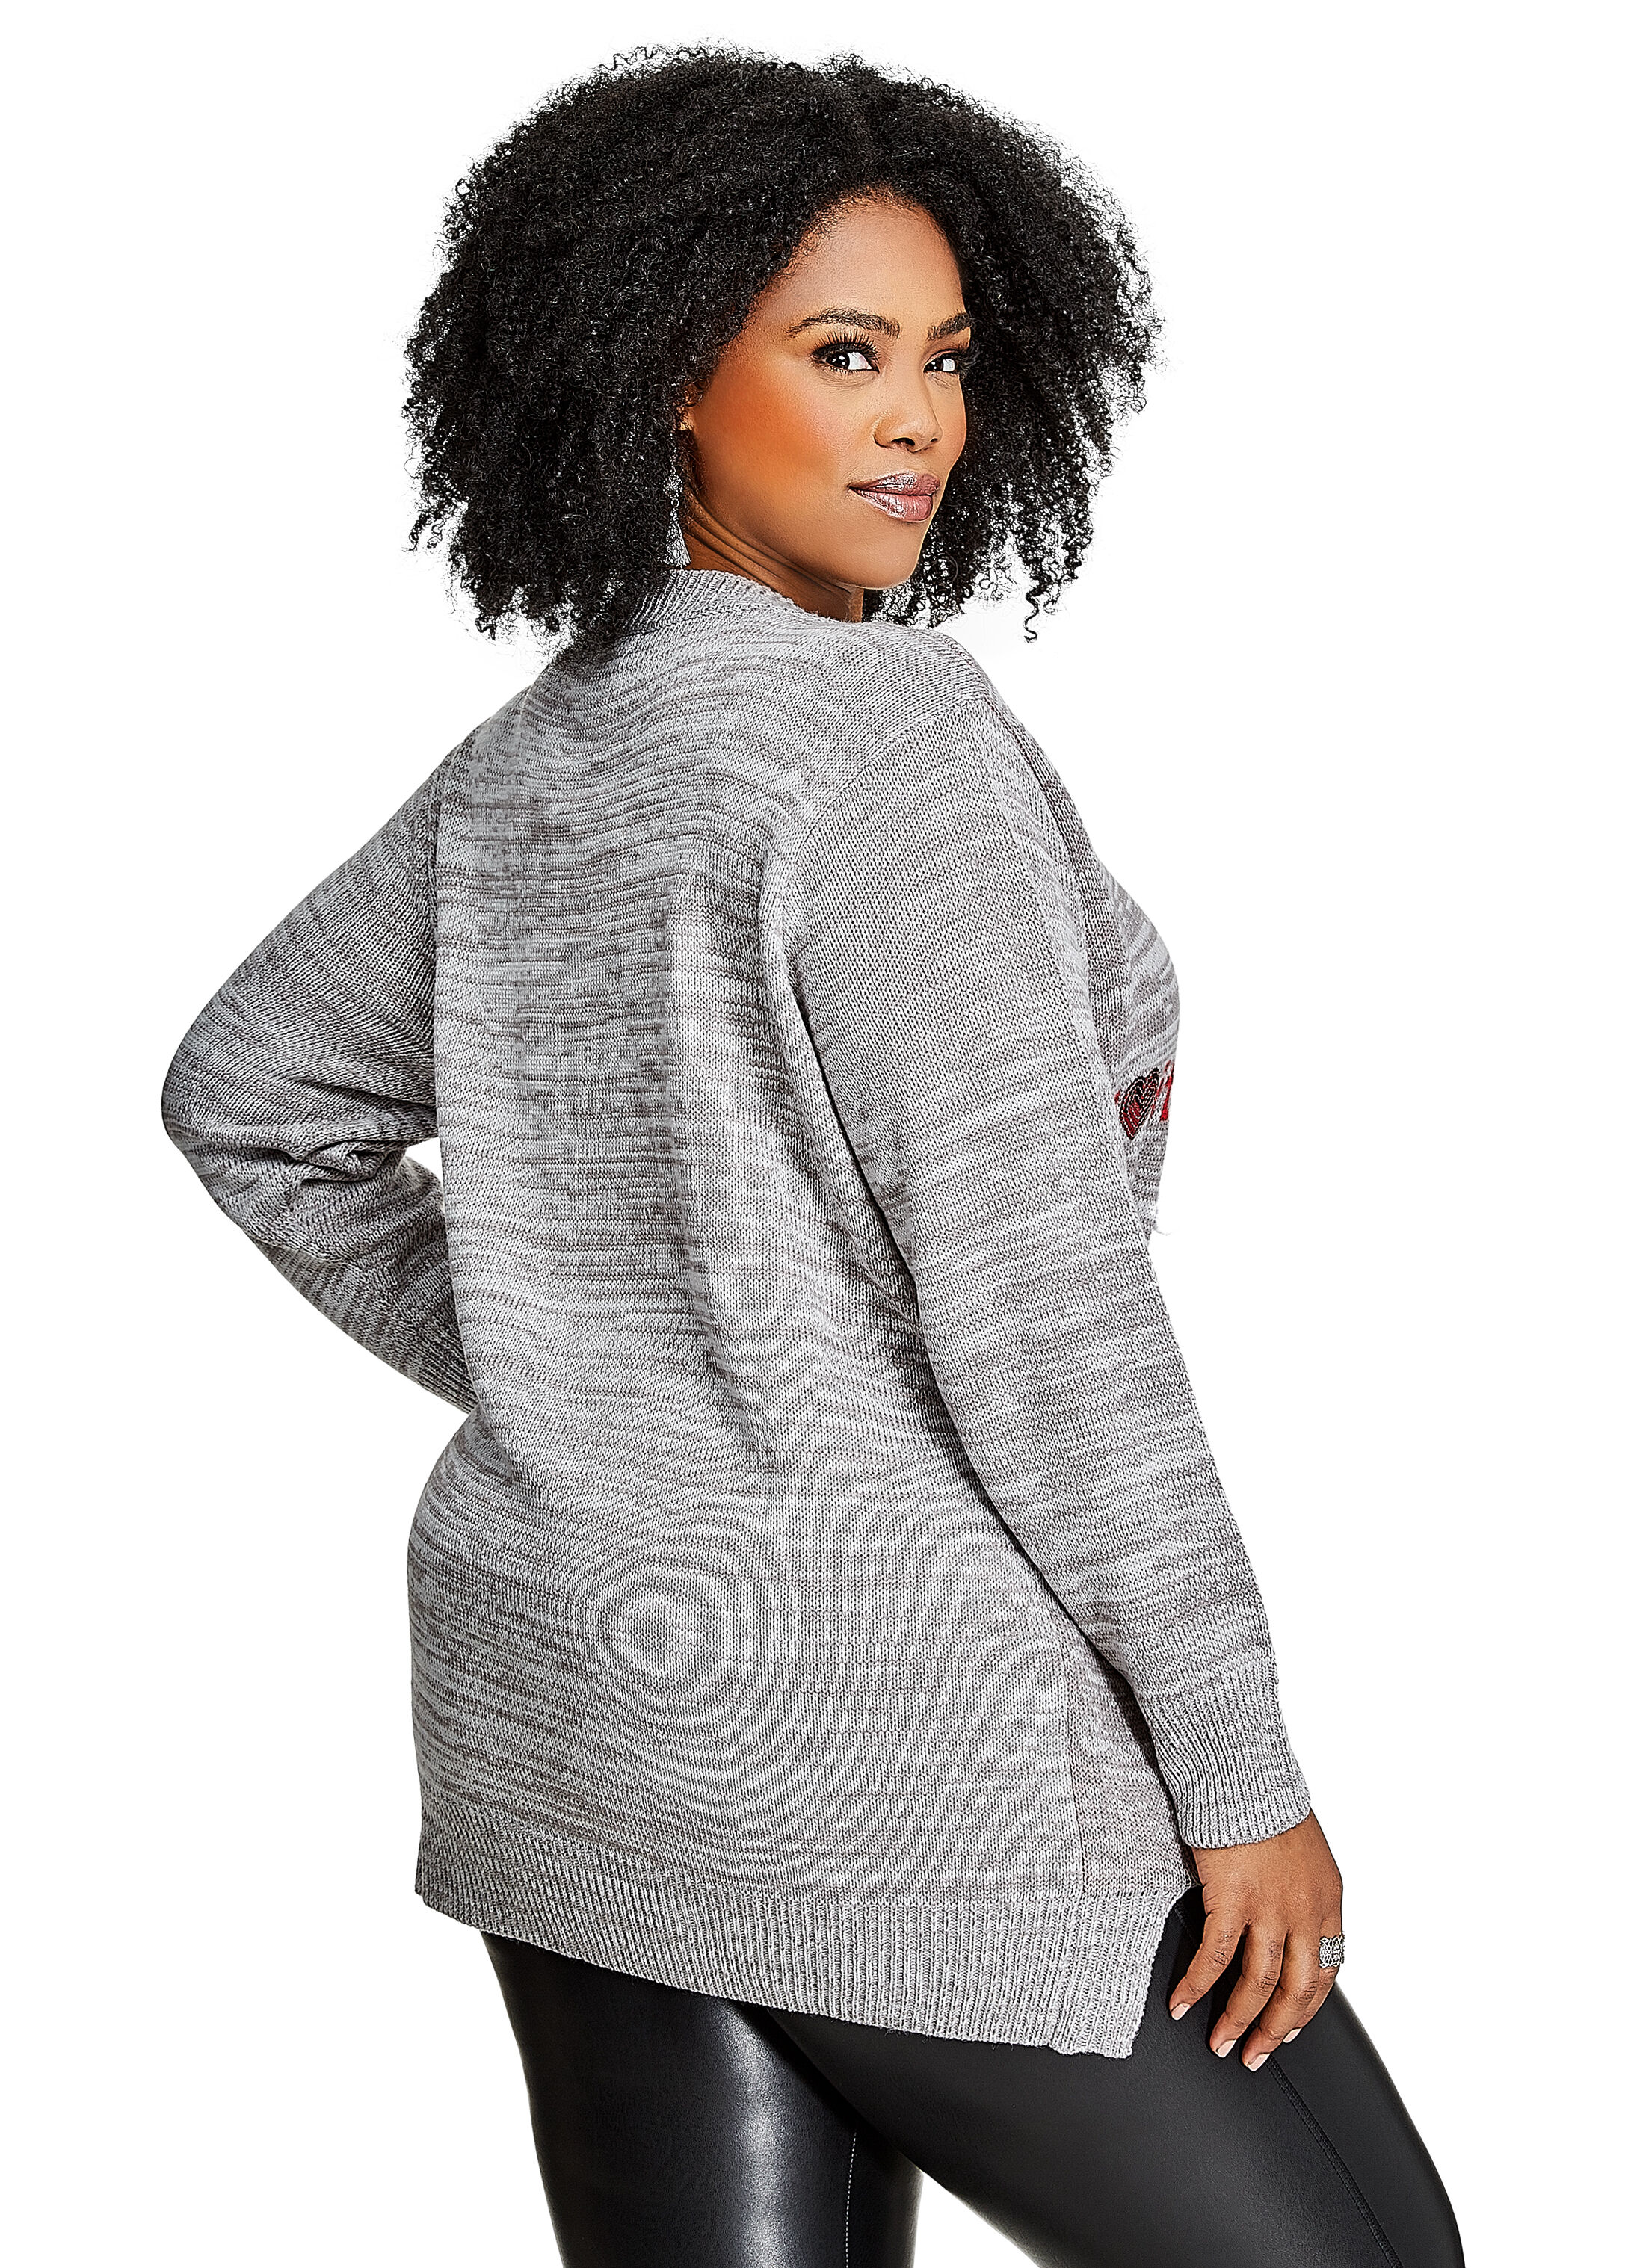 Buy Call Me Big Santa Sweater Grey - Clearance